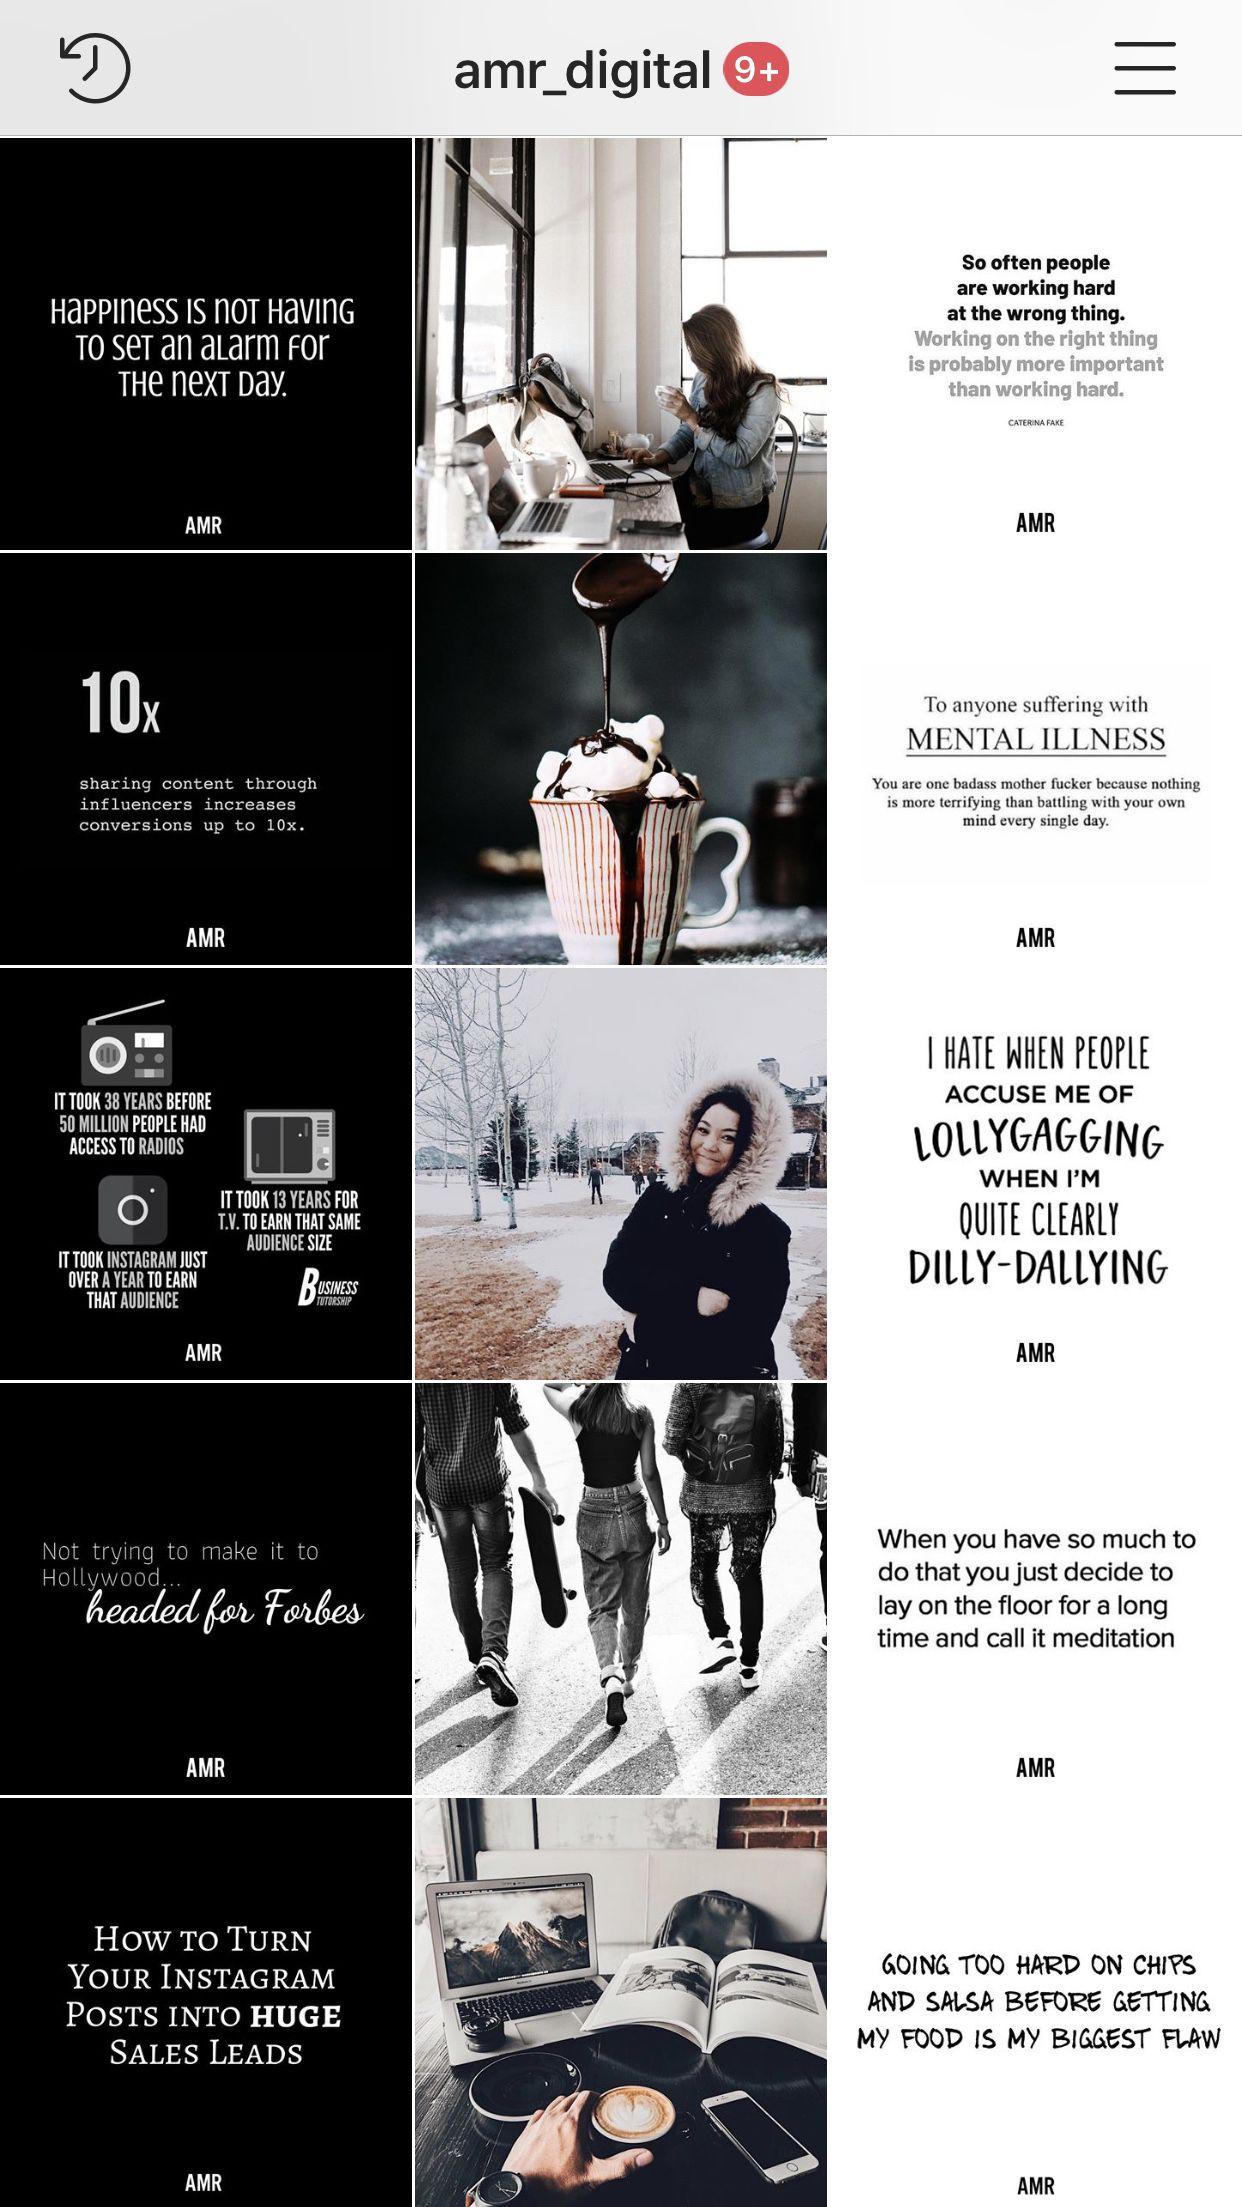 Home Amr Digital Marketing Instagram Design Instagram Feed Ideas Posts Instagram Theme Feed